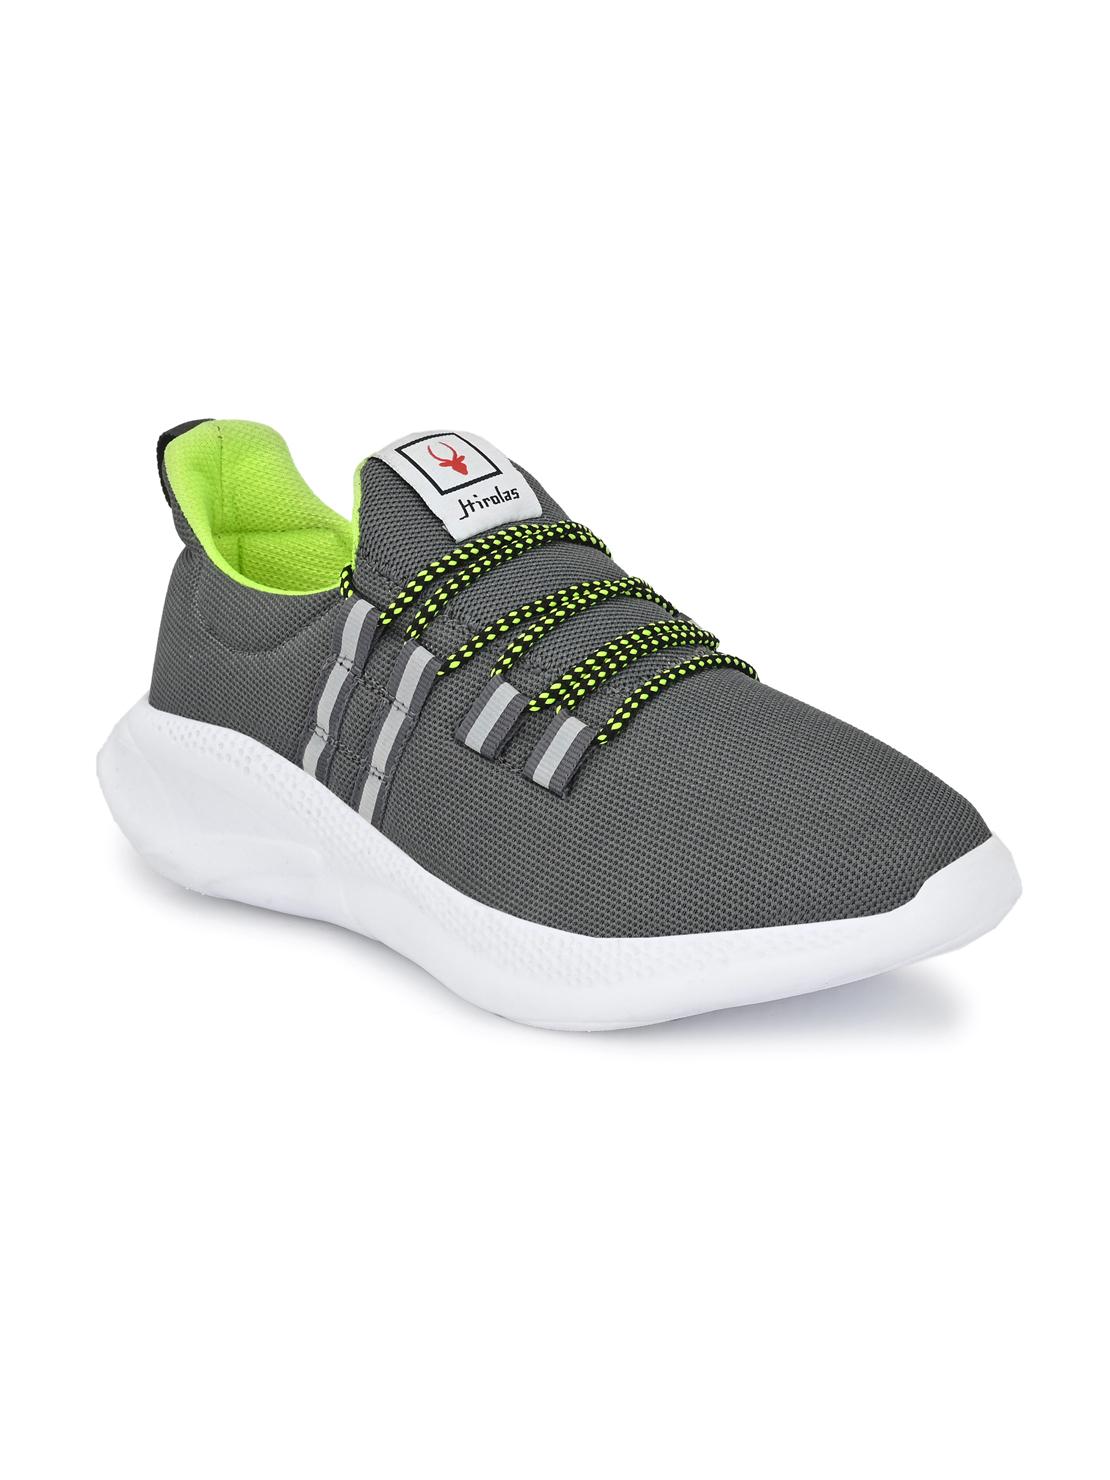 Hirolas | Hirolas® Men's Mesh Grey Walking/Gym/Running Sports Sneaker Shoes